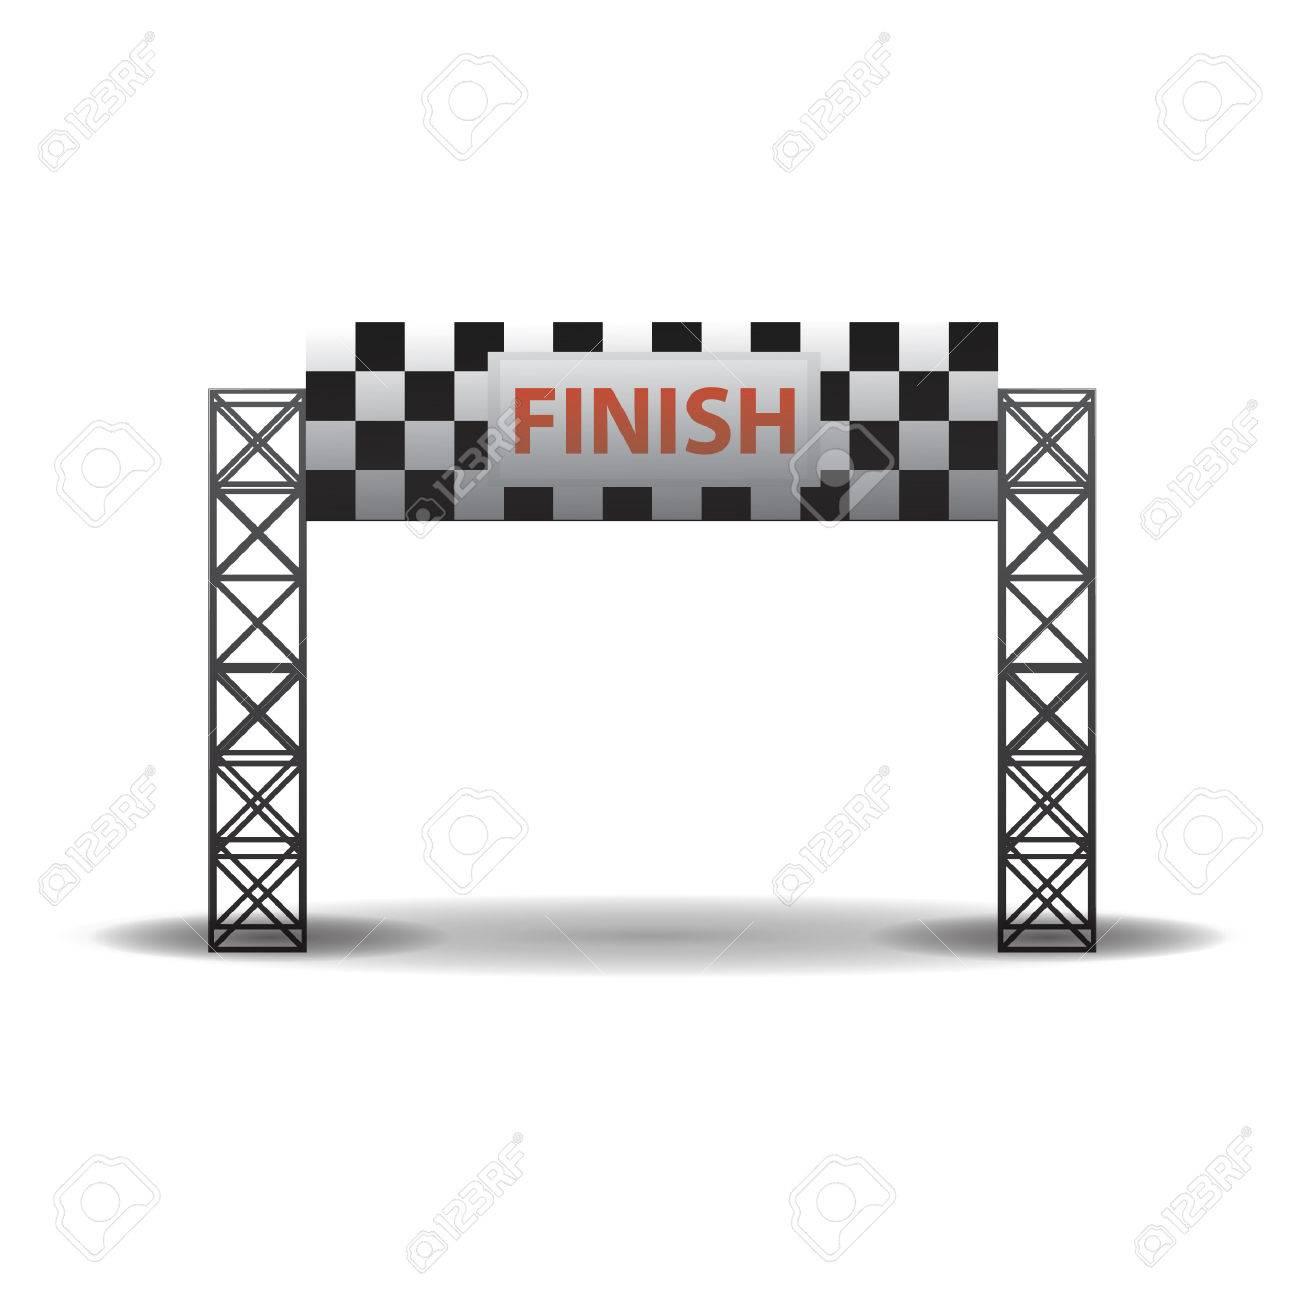 finish line banner.